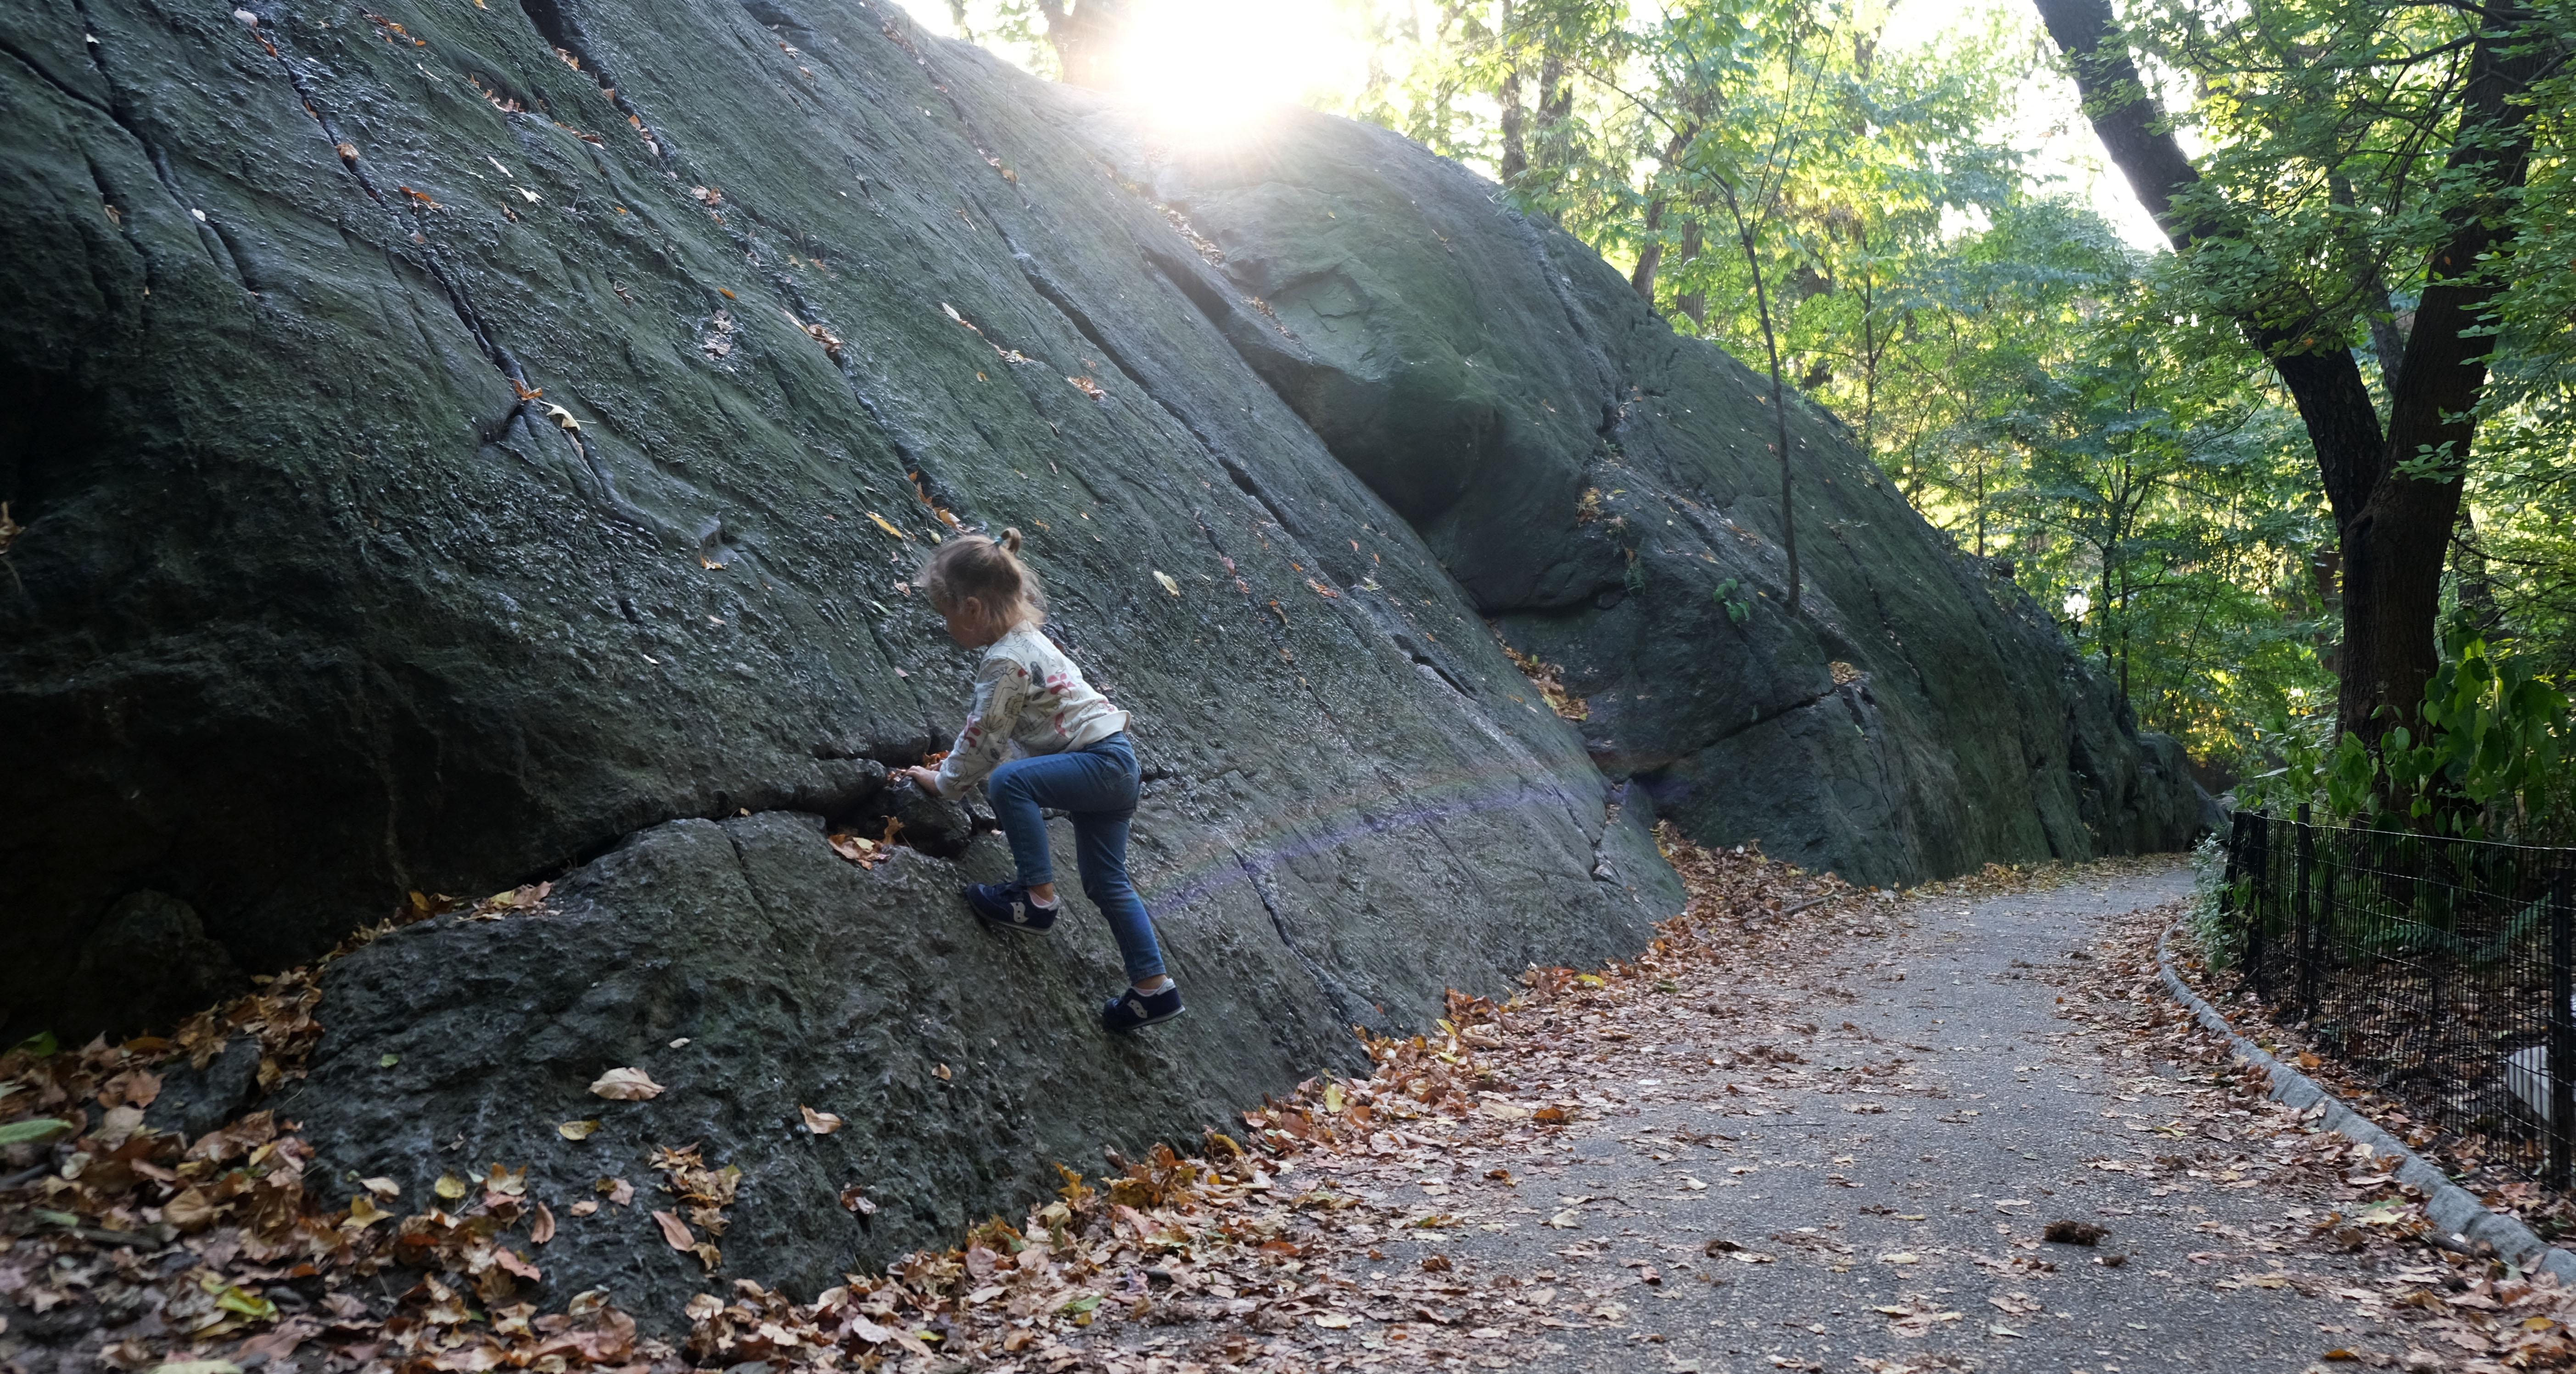 Anastasia does bouldering in Central Park